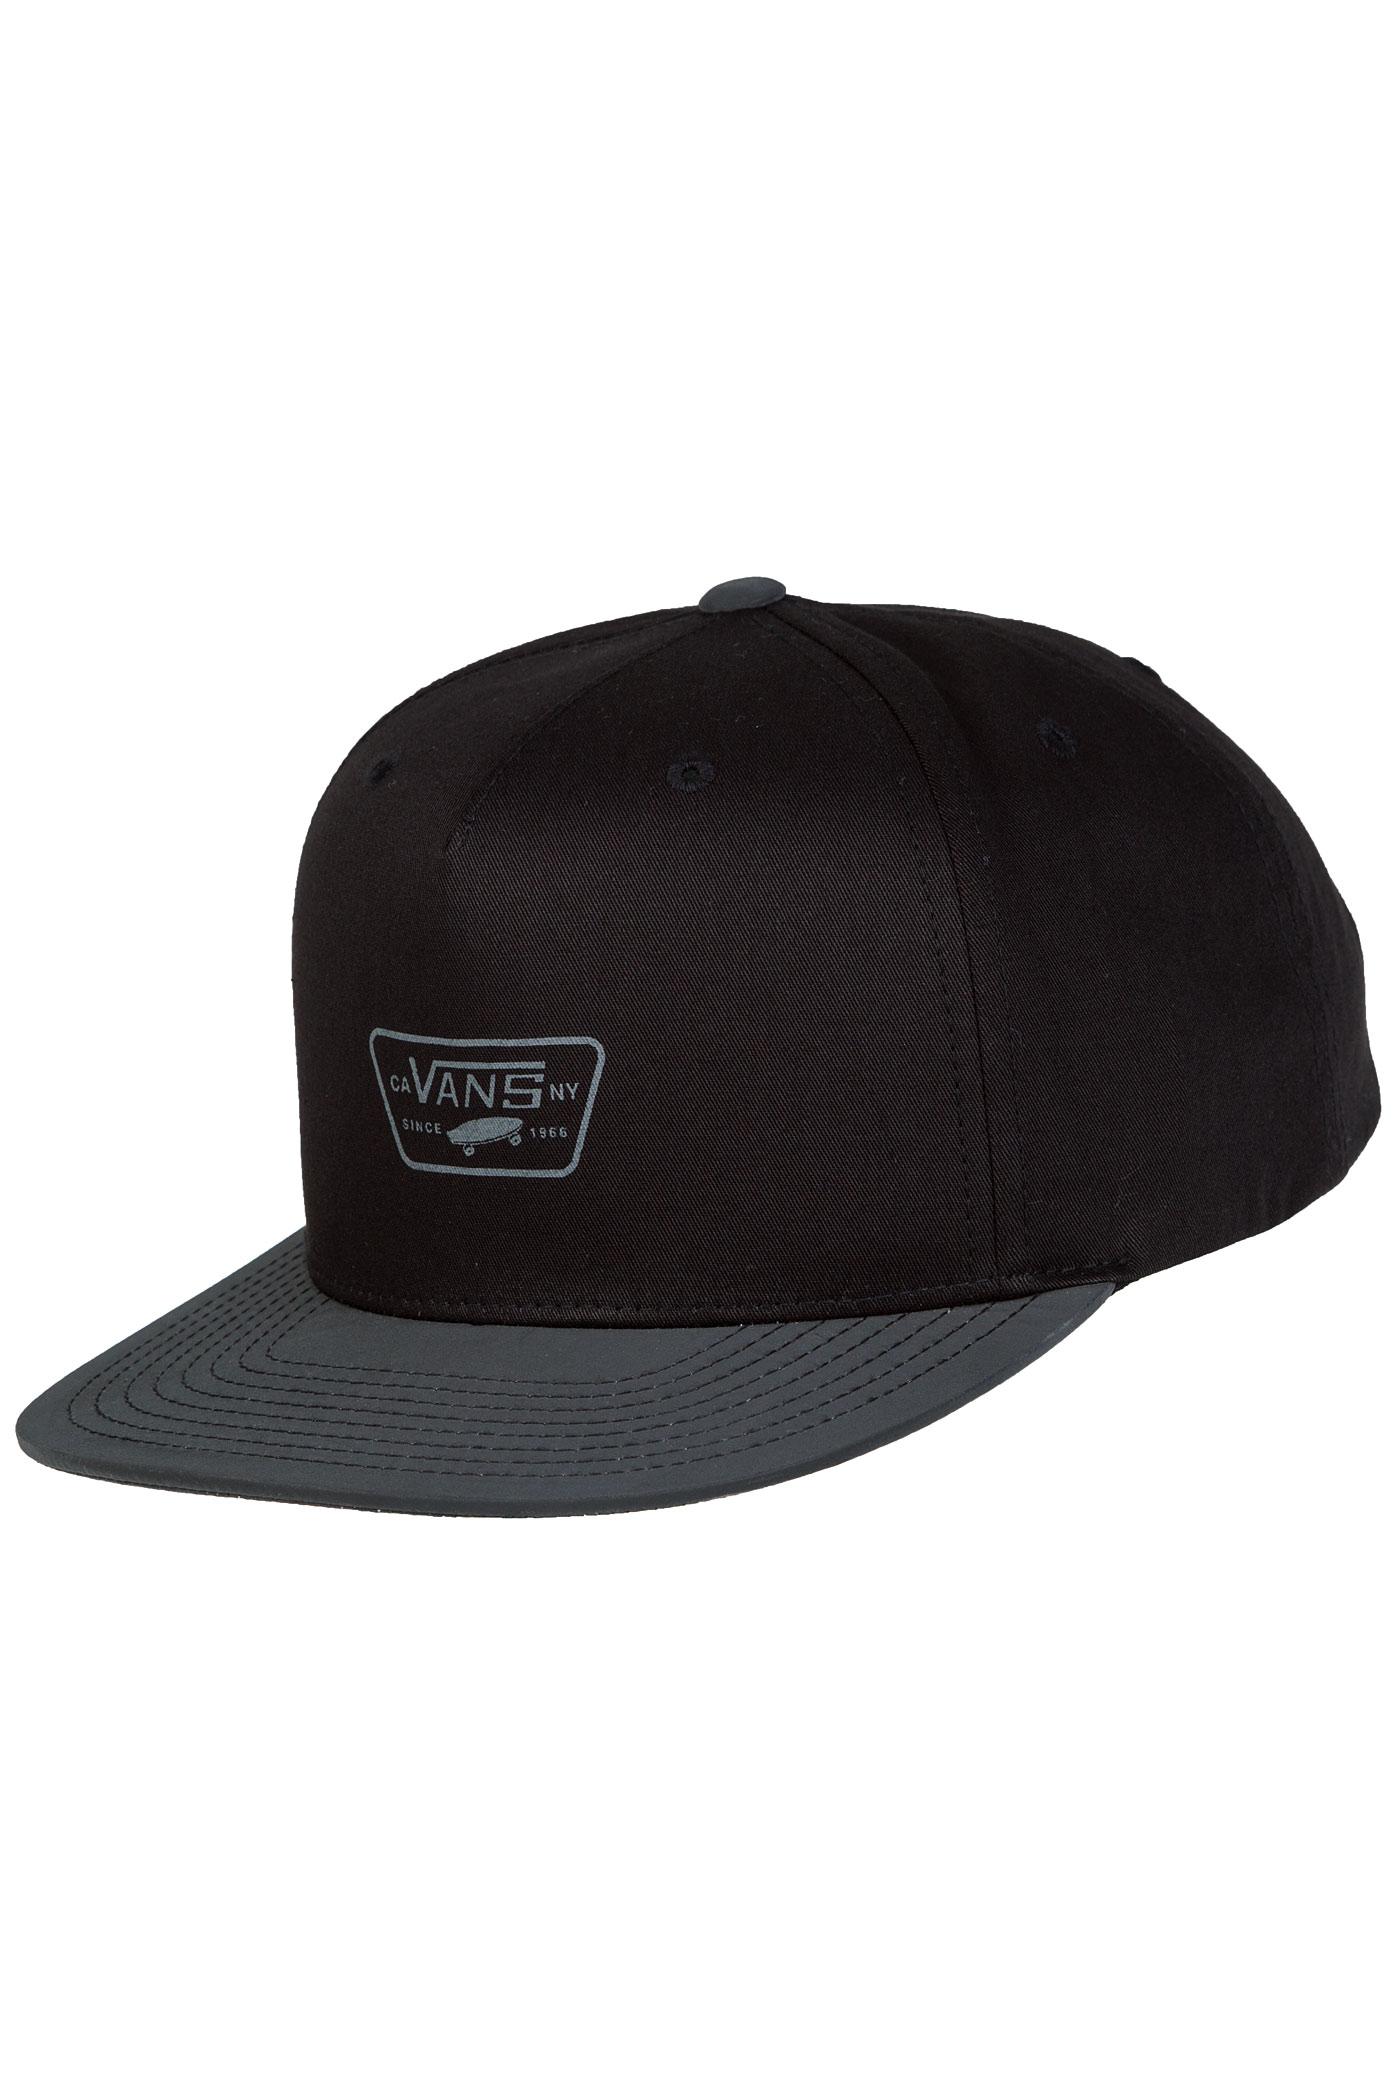 33c38cdd29 Vans Reflect Snapback Cap (black) buy at skatedeluxe